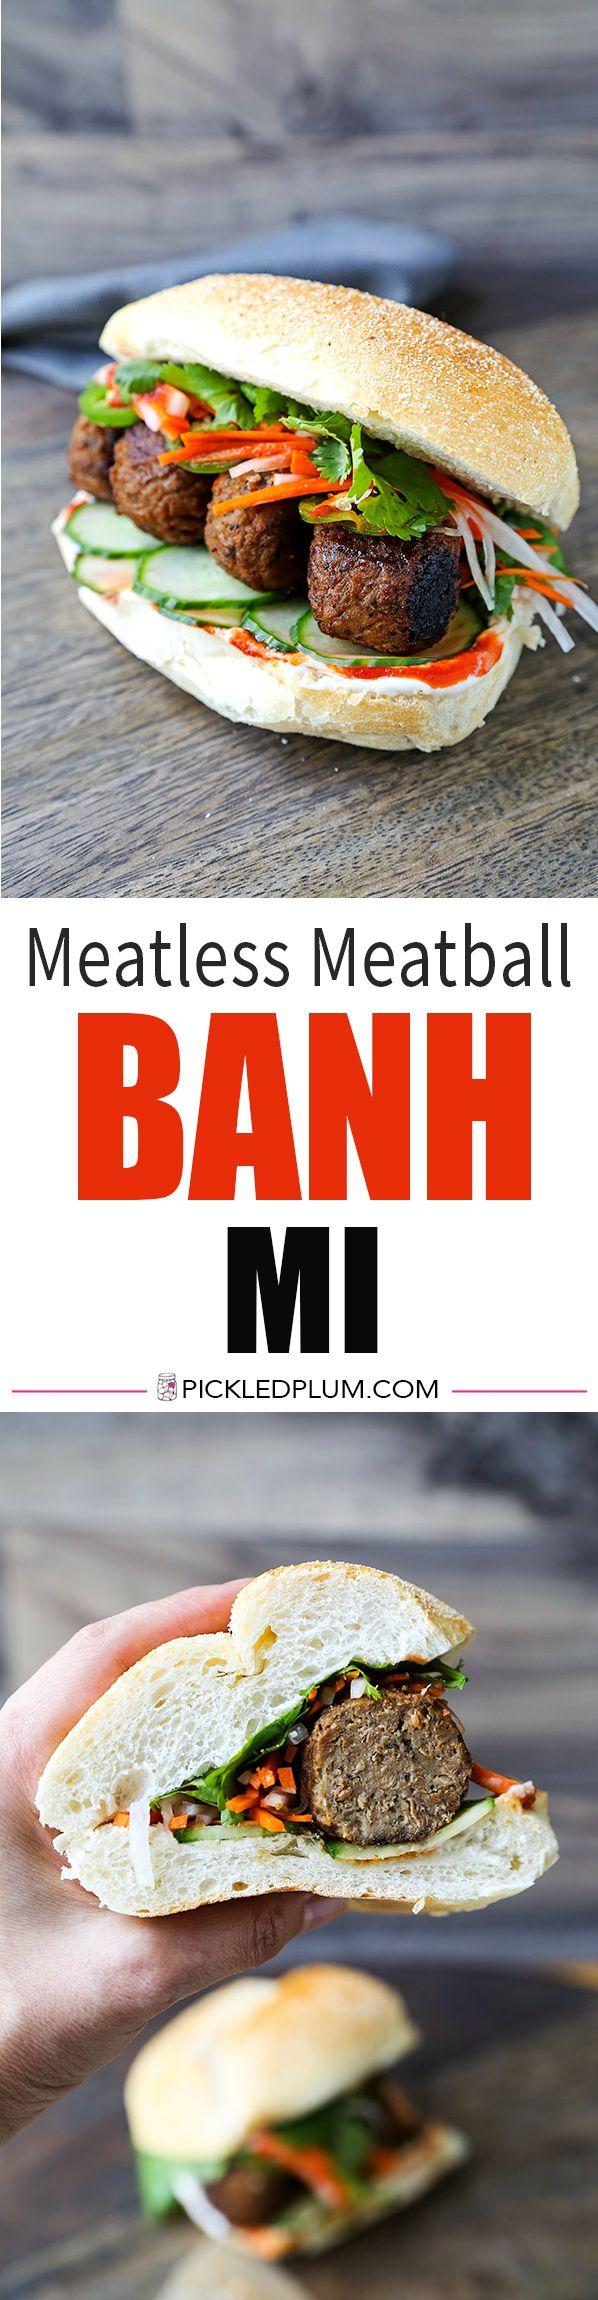 Meatless Meatball Banh Mi